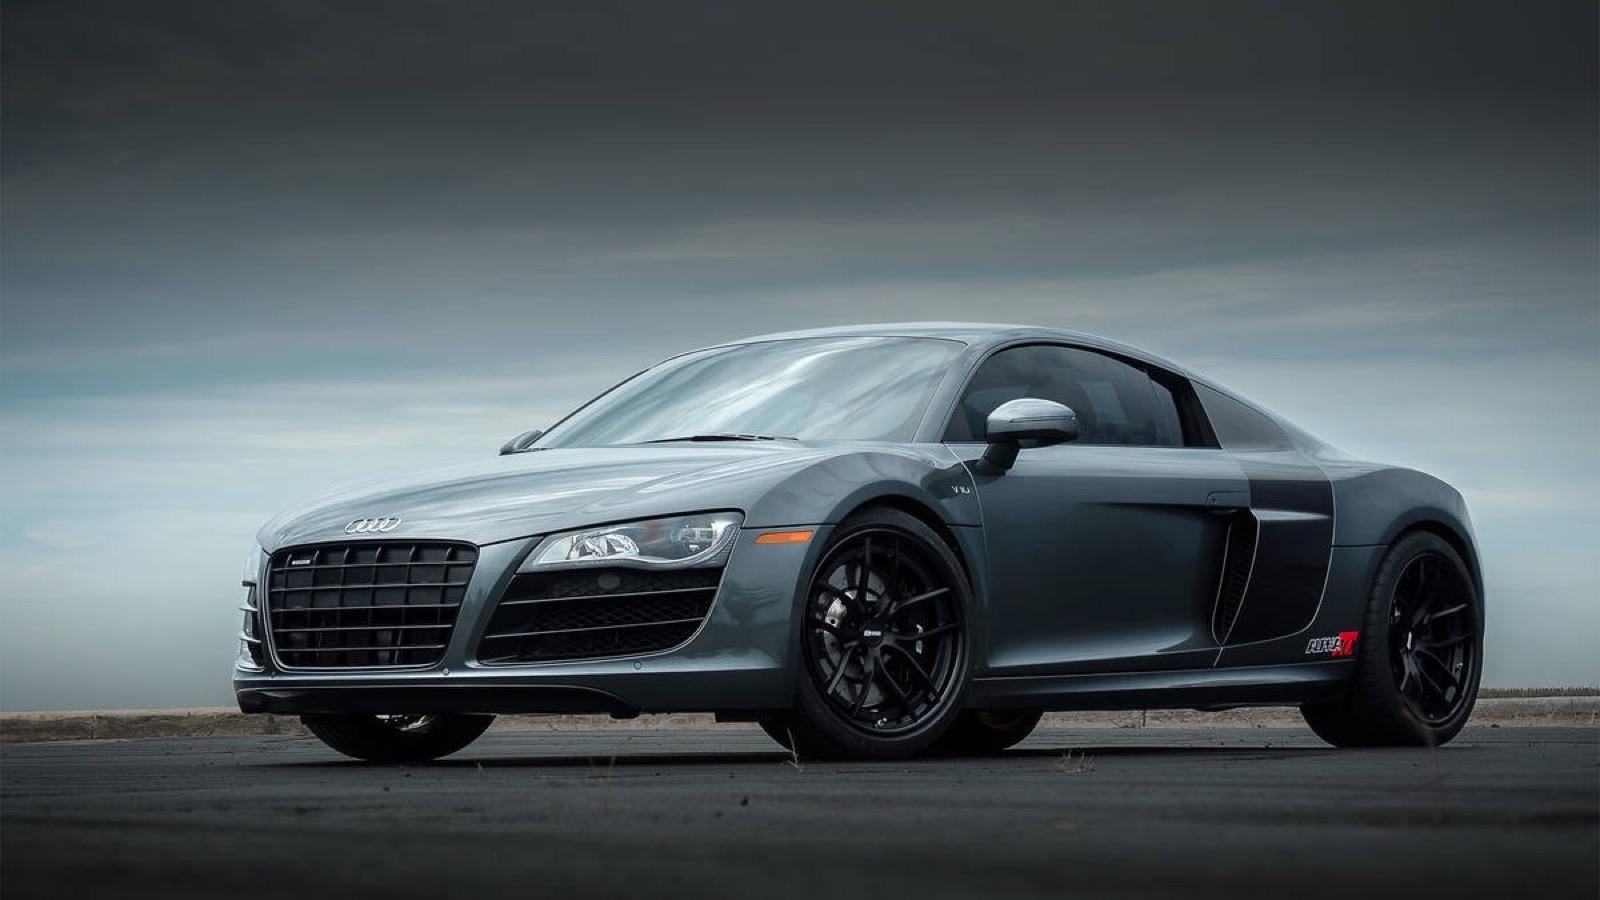 Audi_R8_AMS_Alpha_10_08